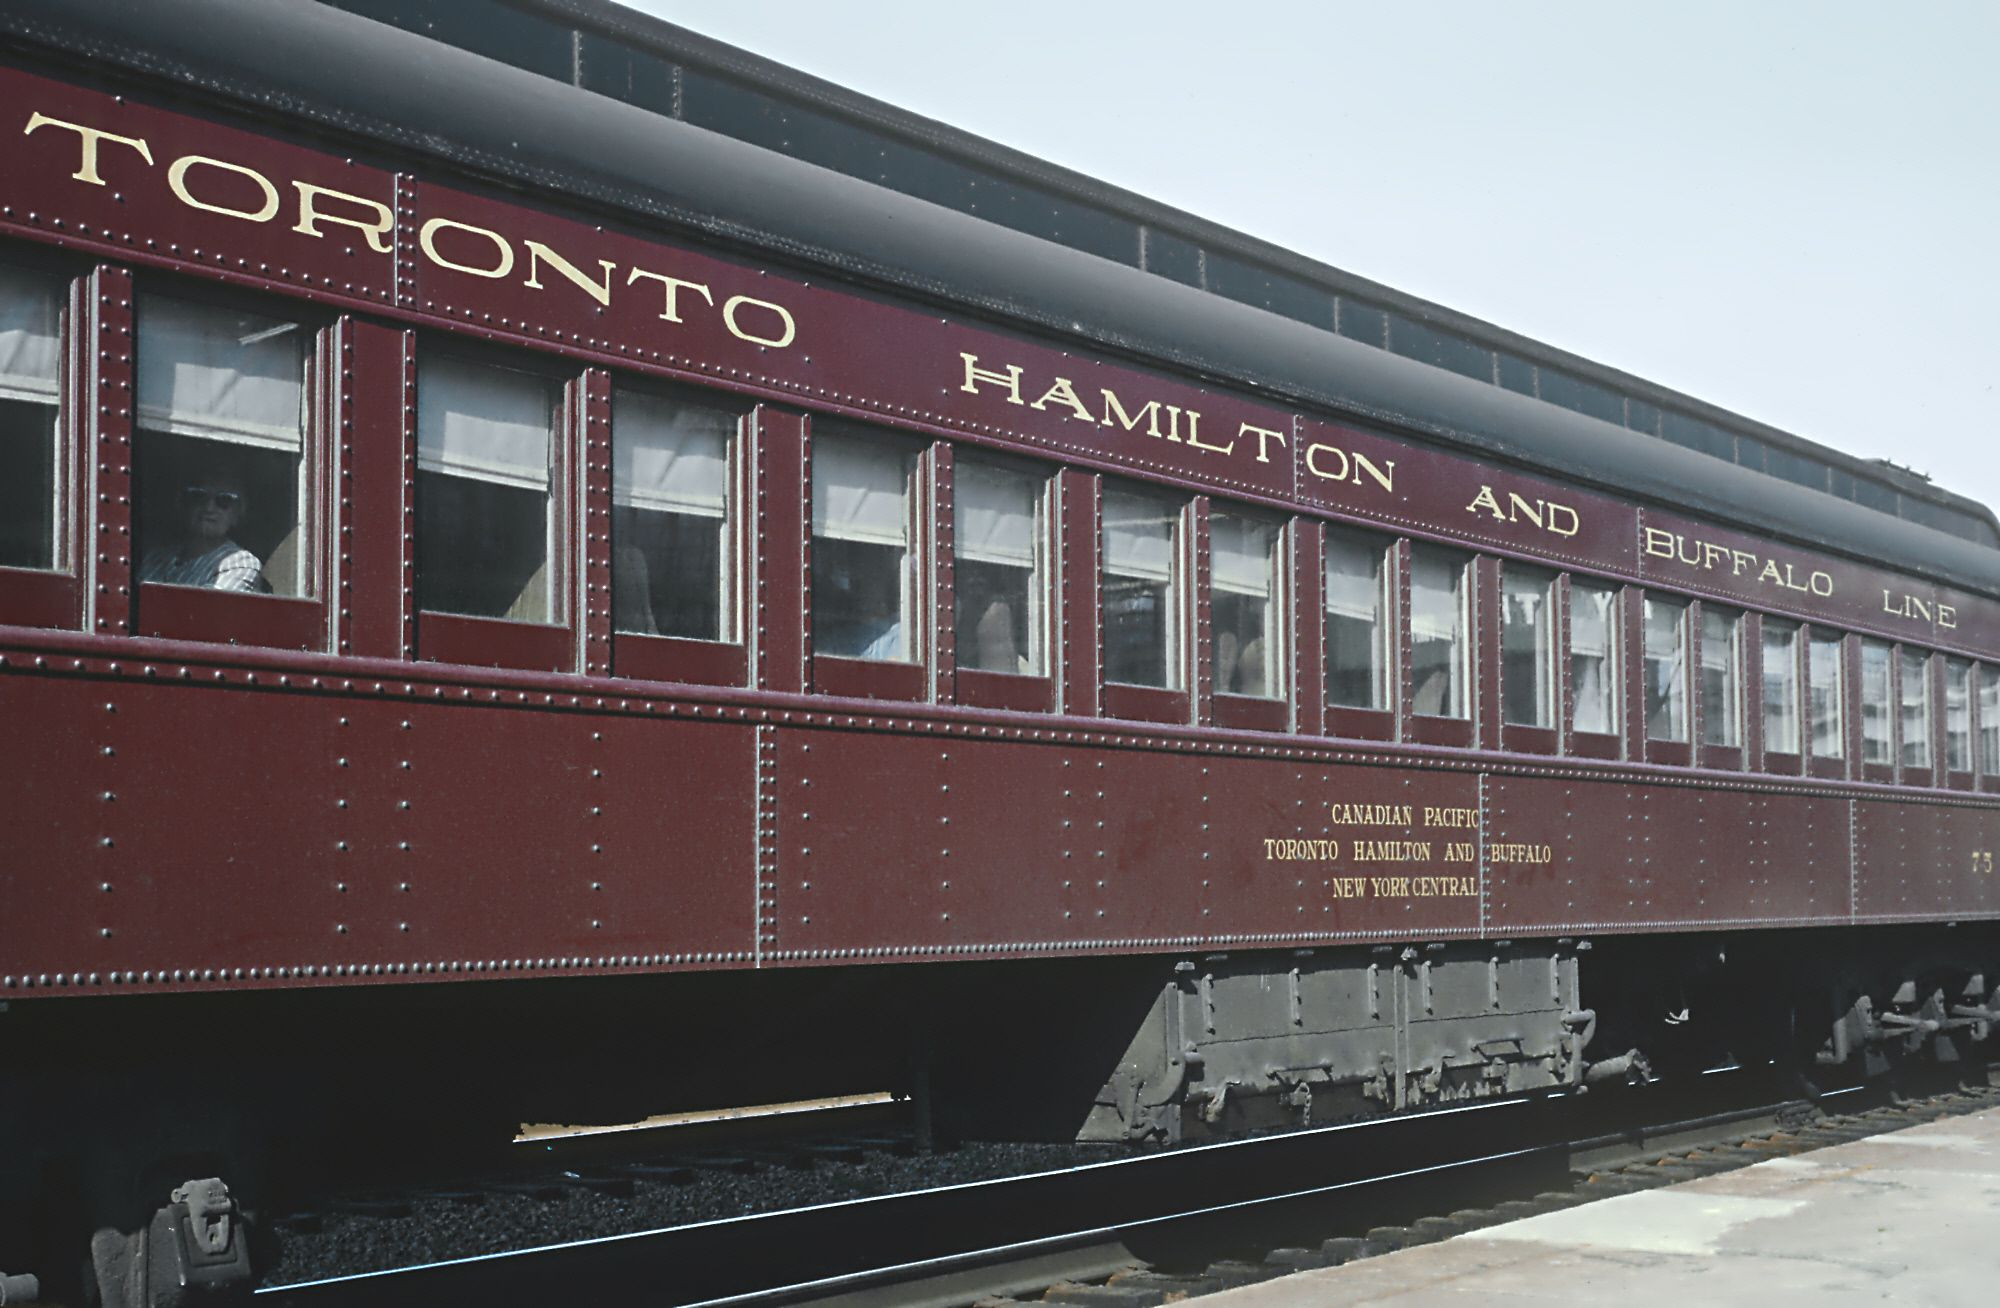 Toronto,_Hamilton_and_Buffalo_on_CP,_Train_322,_the_Ontarian_at_Sunnyside_station,_Toronto,_On...jpg